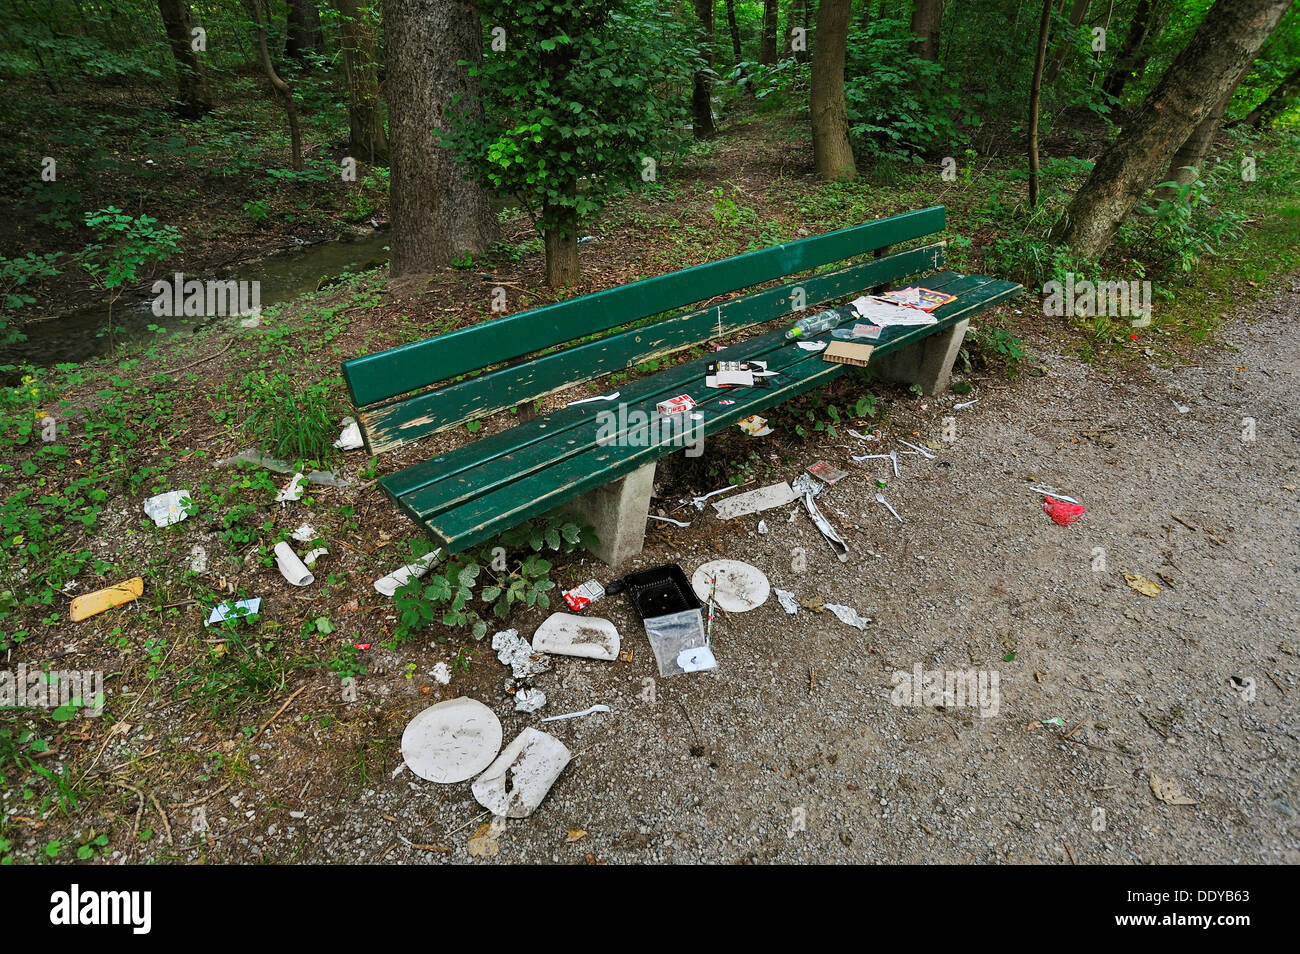 Park bench with garbage in the Isarauen floodplain, Munich, Bavaria - Stock Image